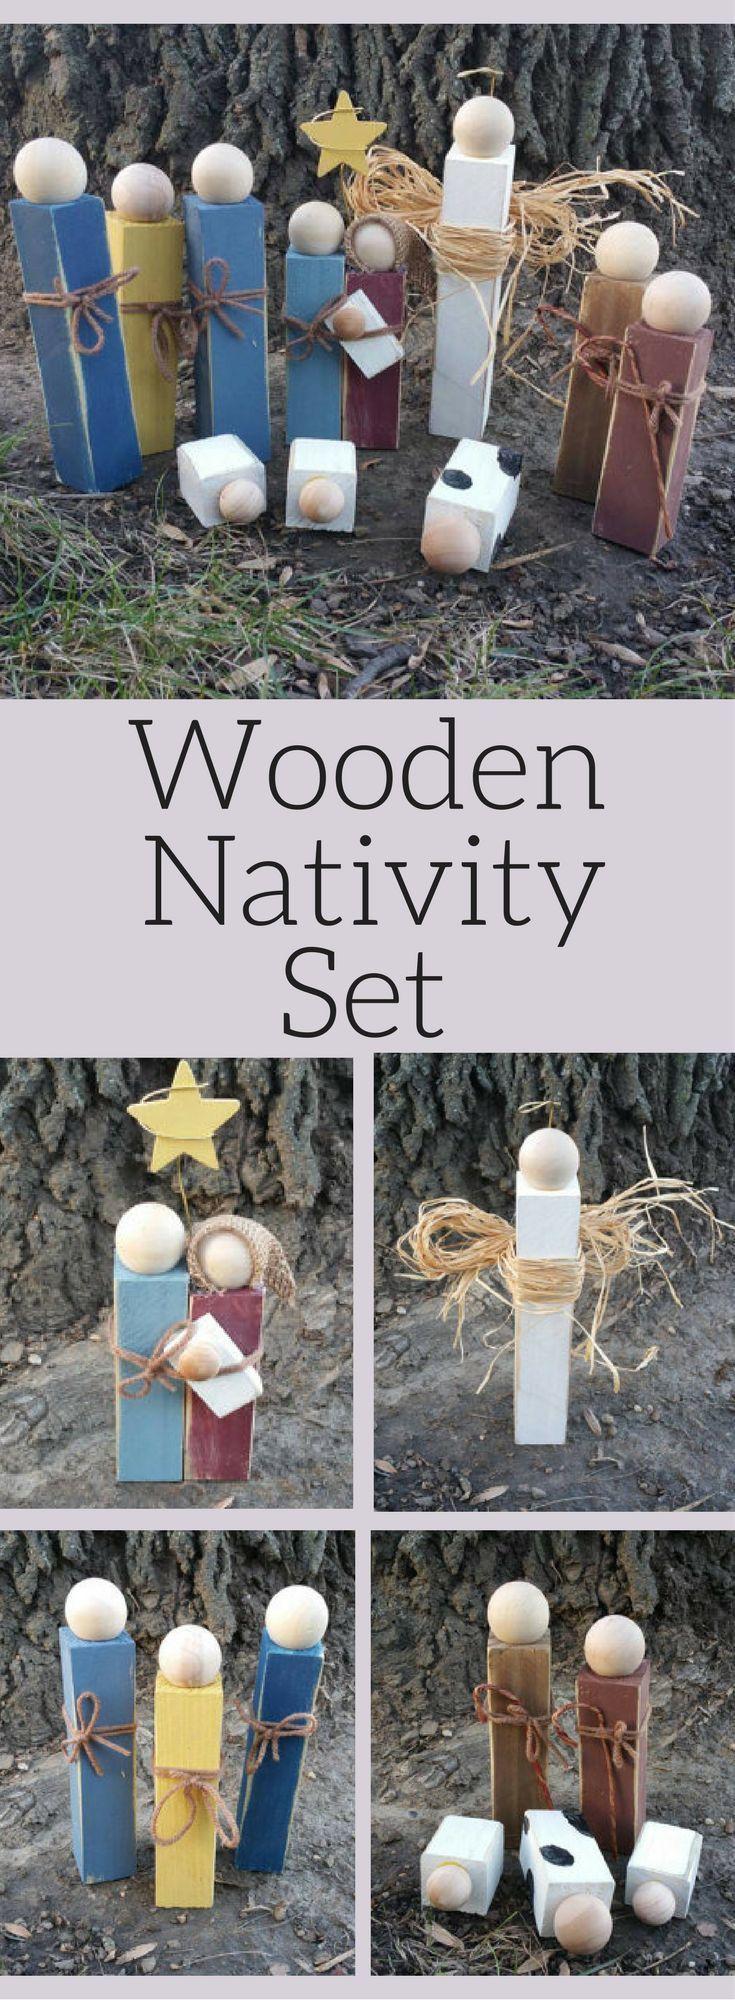 Wooden Nativity Set, Christmas Decor , Wood Christmas Nativity scene, Rustic Christmas Decoration, Rustic decor, Sold as Full 12-Piece Set, #affiliate